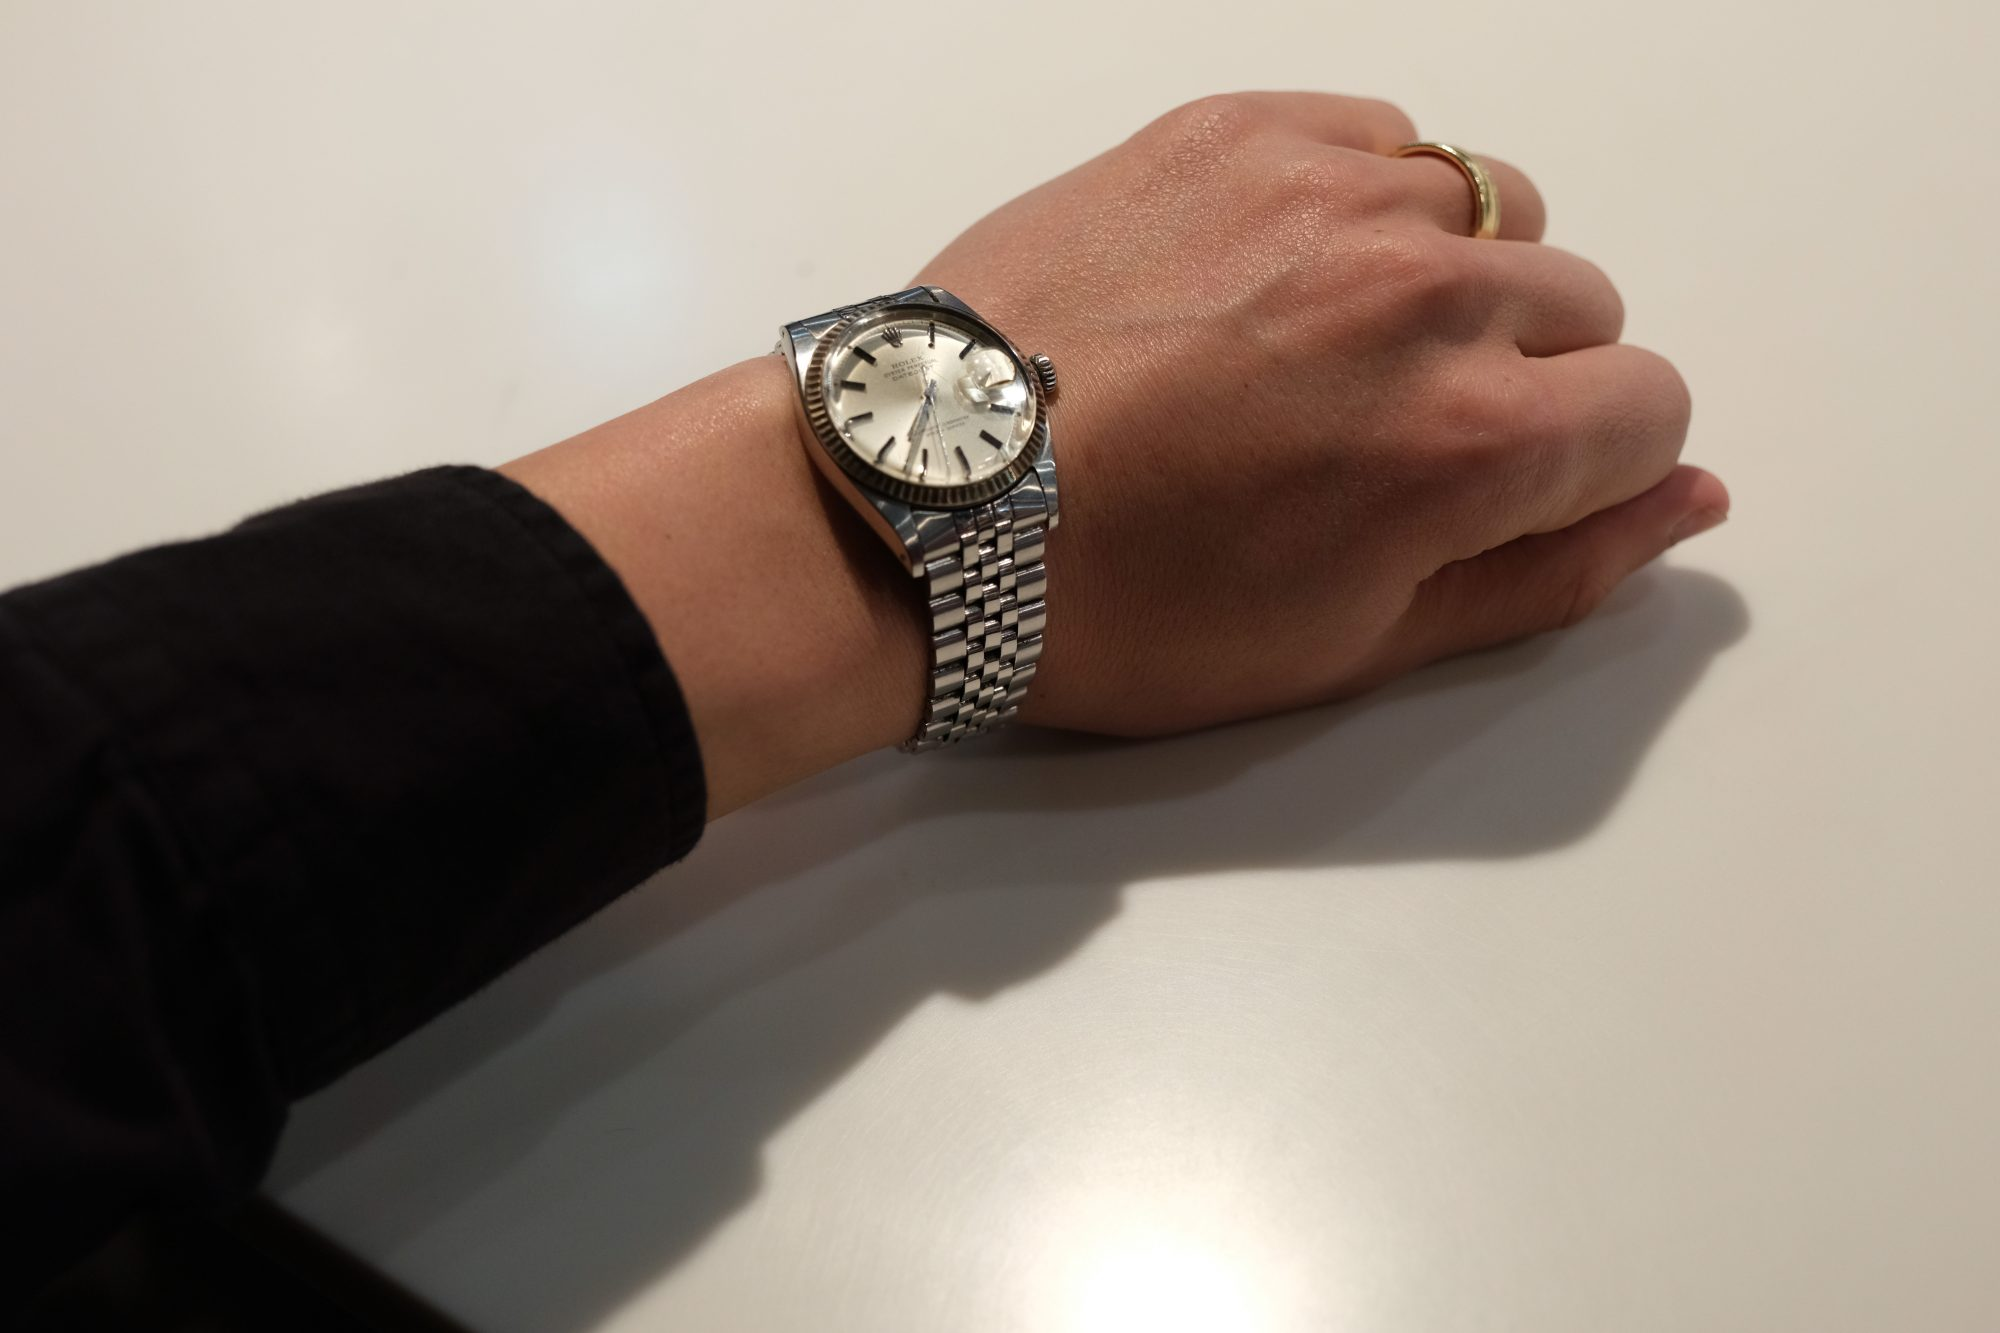 Rolex watch time